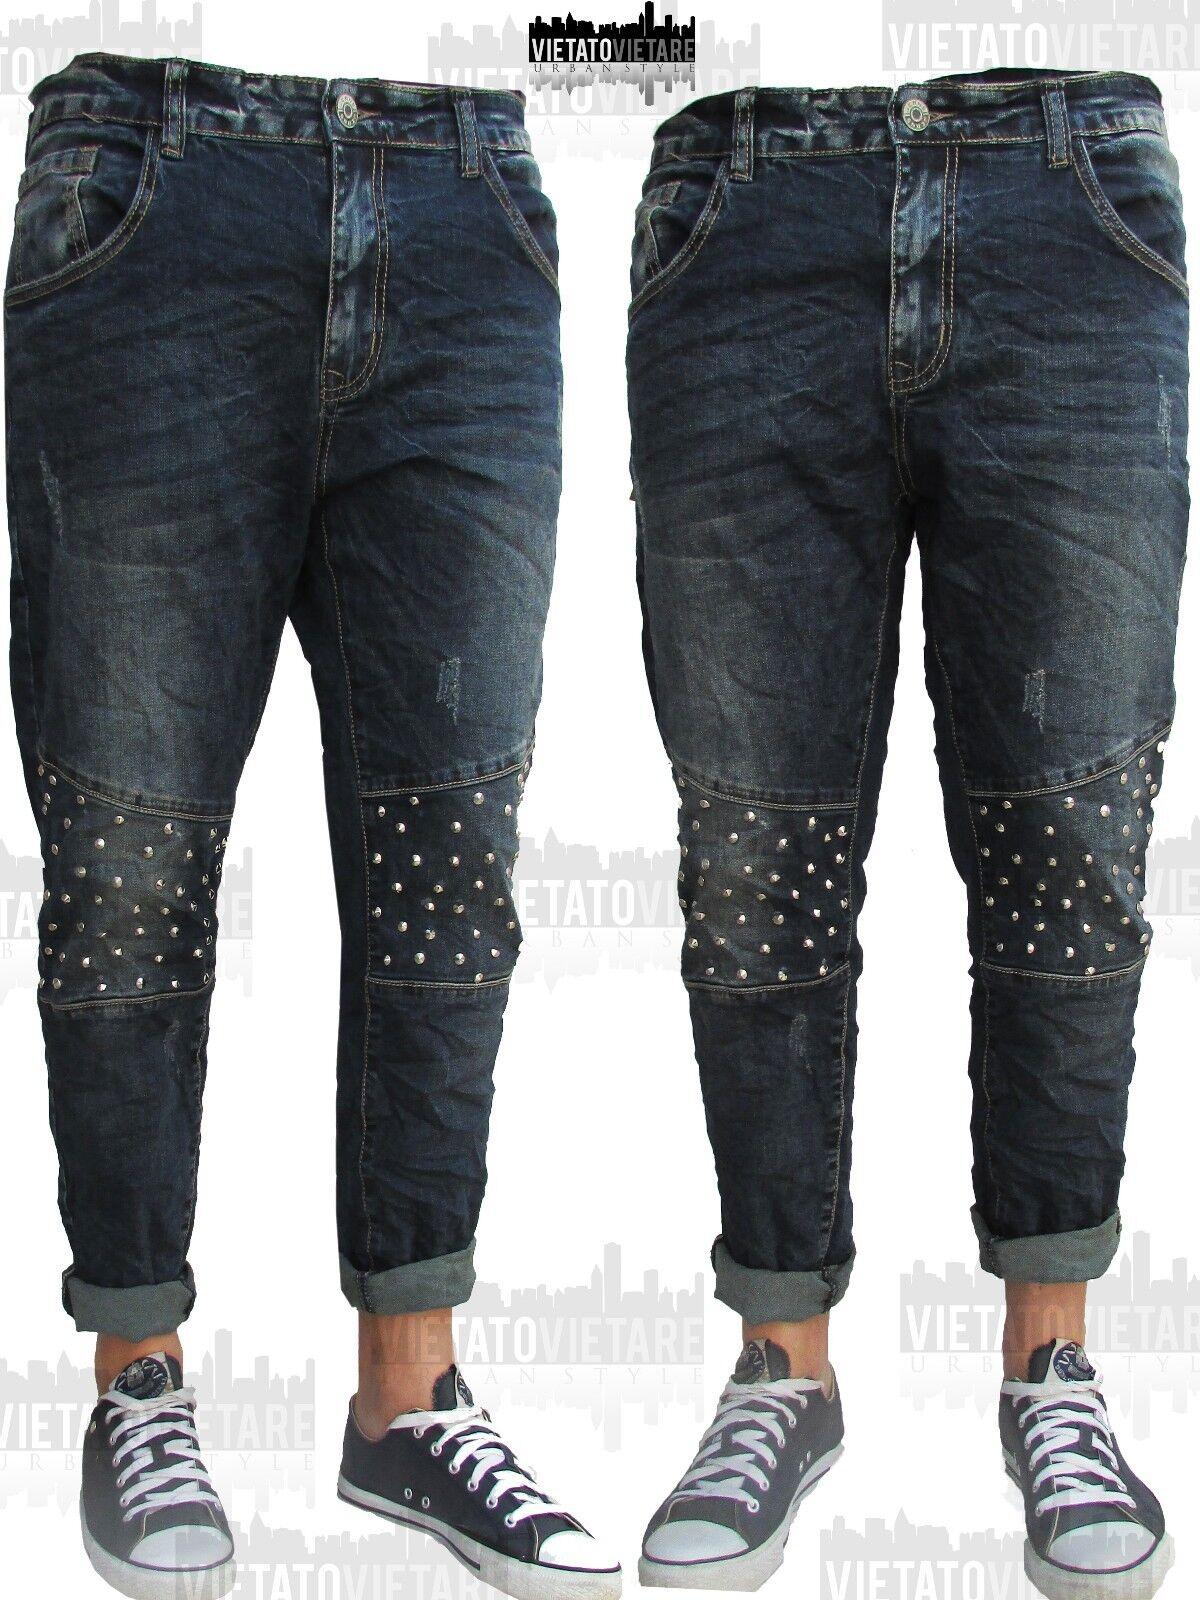 Menswear Jeans Pantalone Borchie Uomo Stretch RegularFit Denim Capri Gamba Larga